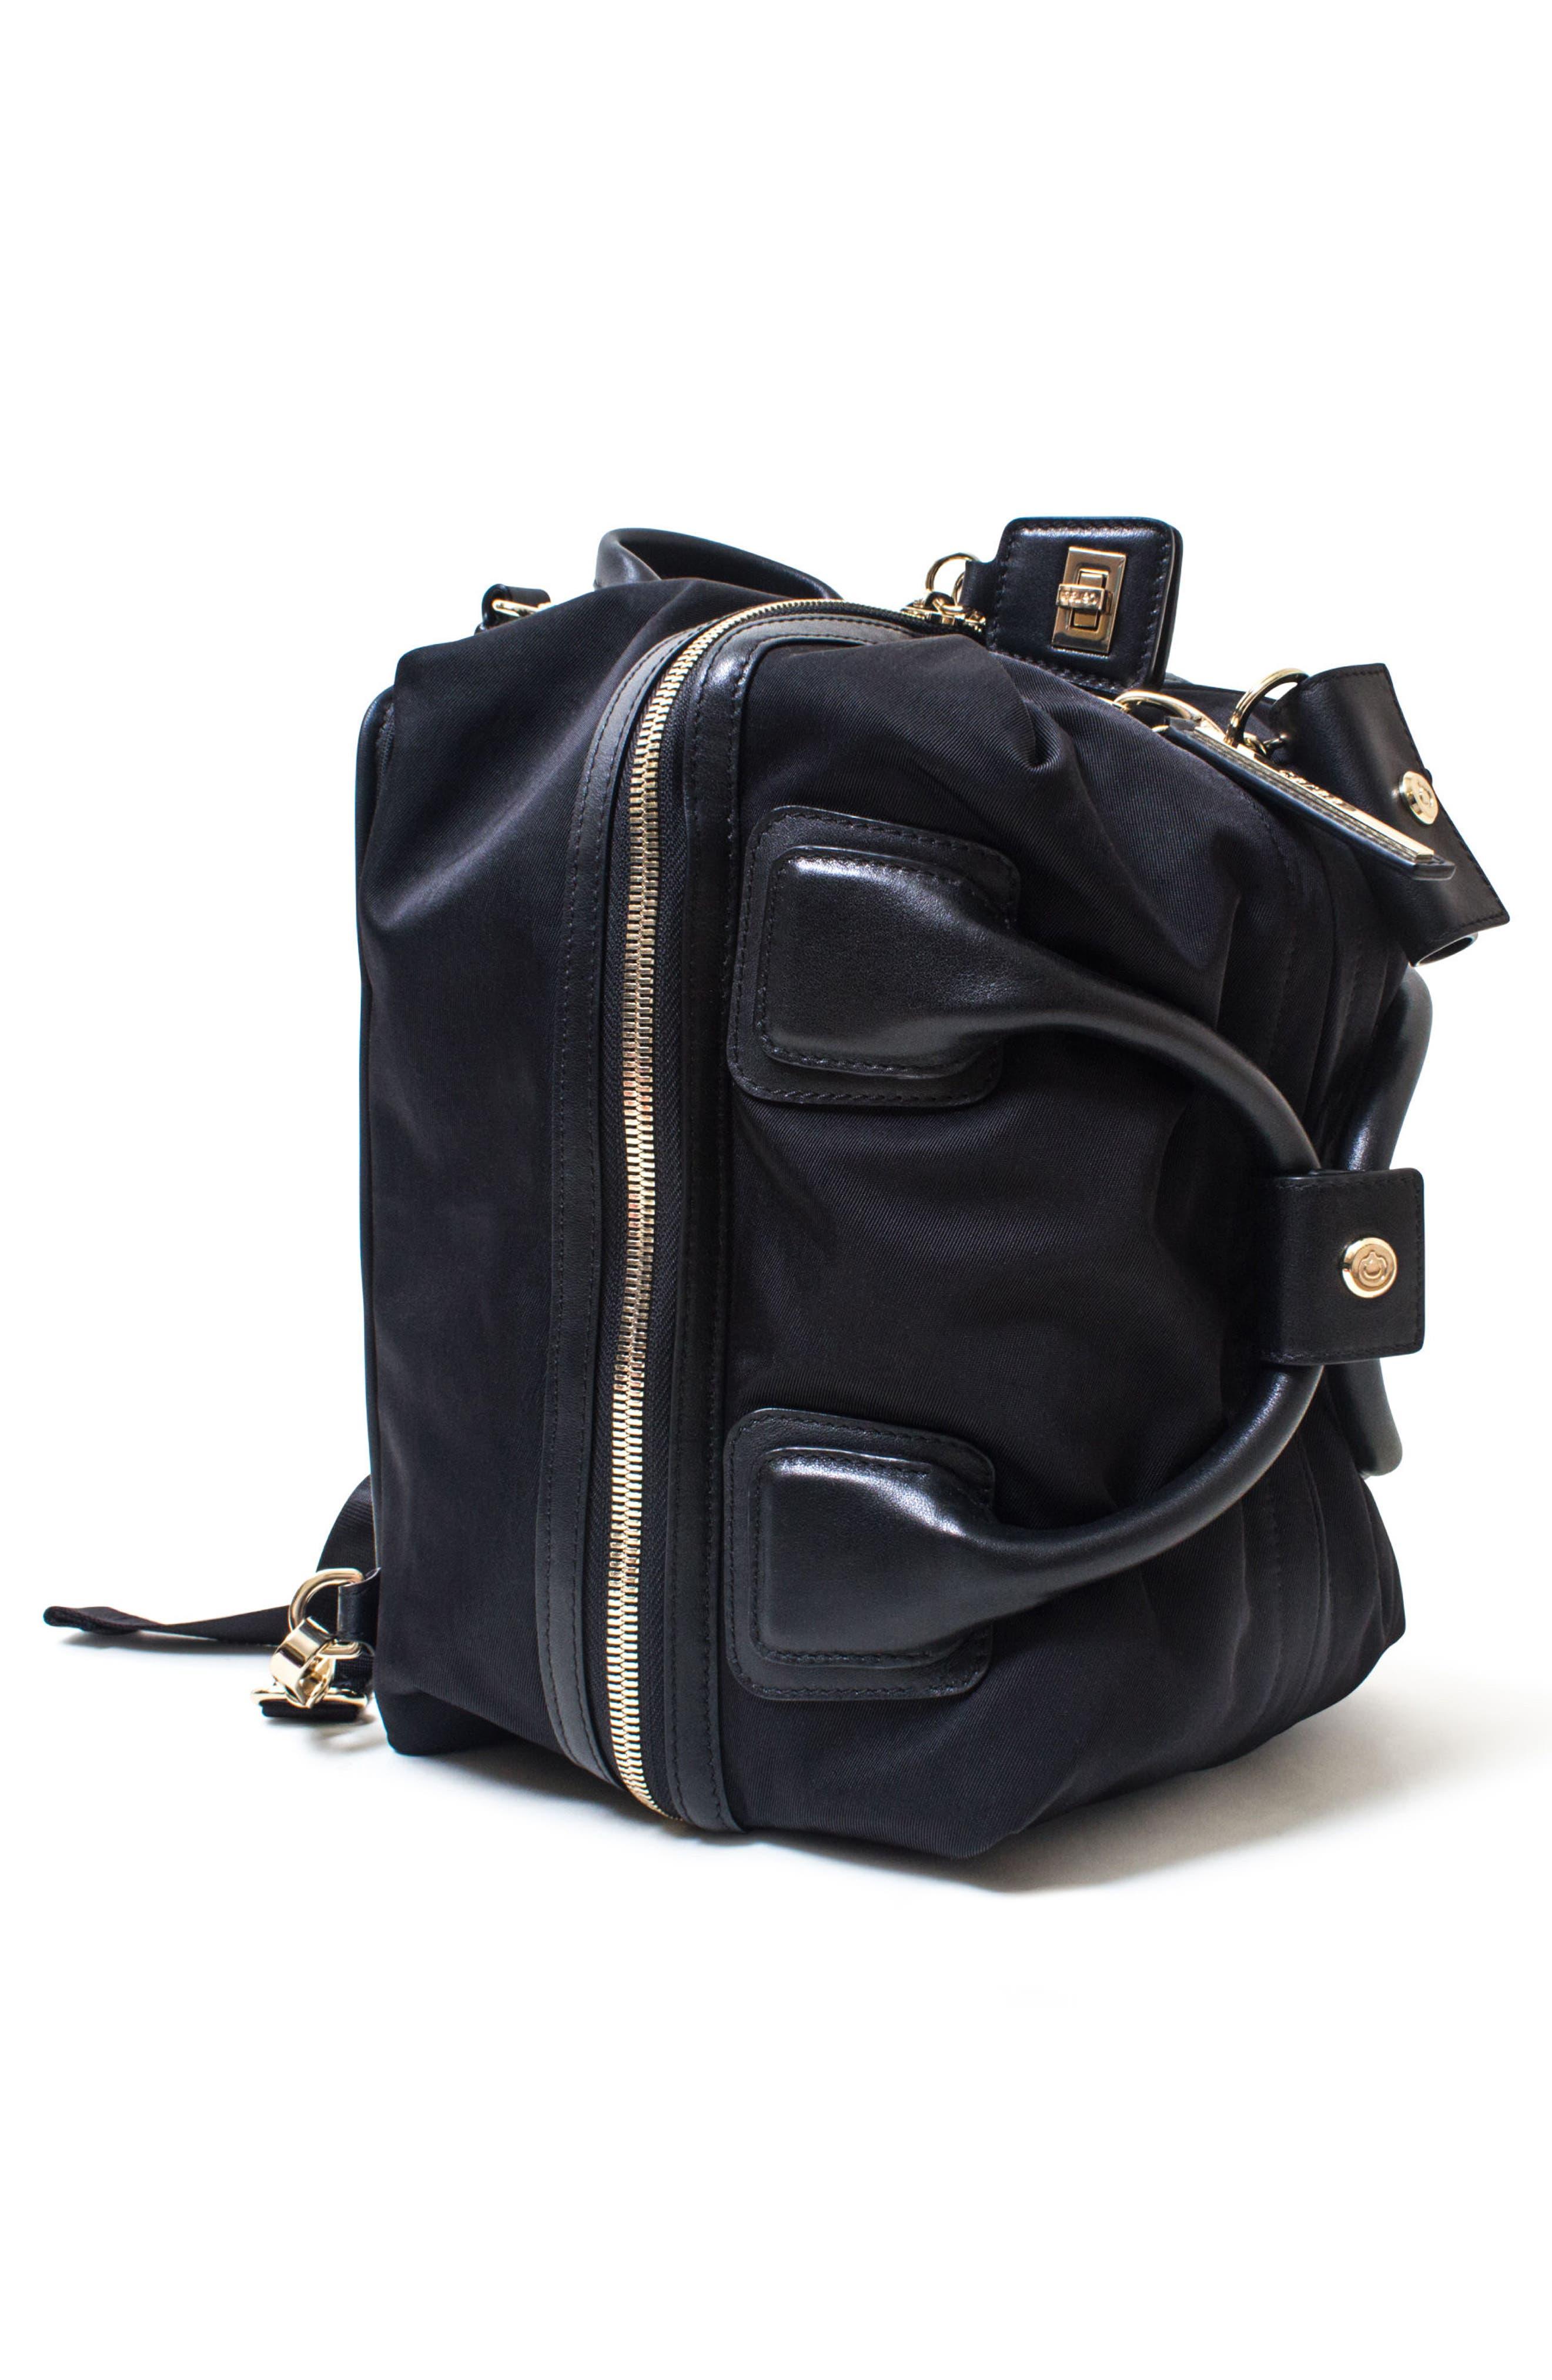 Studio Duffel Backpack,                             Alternate thumbnail 3, color,                             BLACK/ GOLD